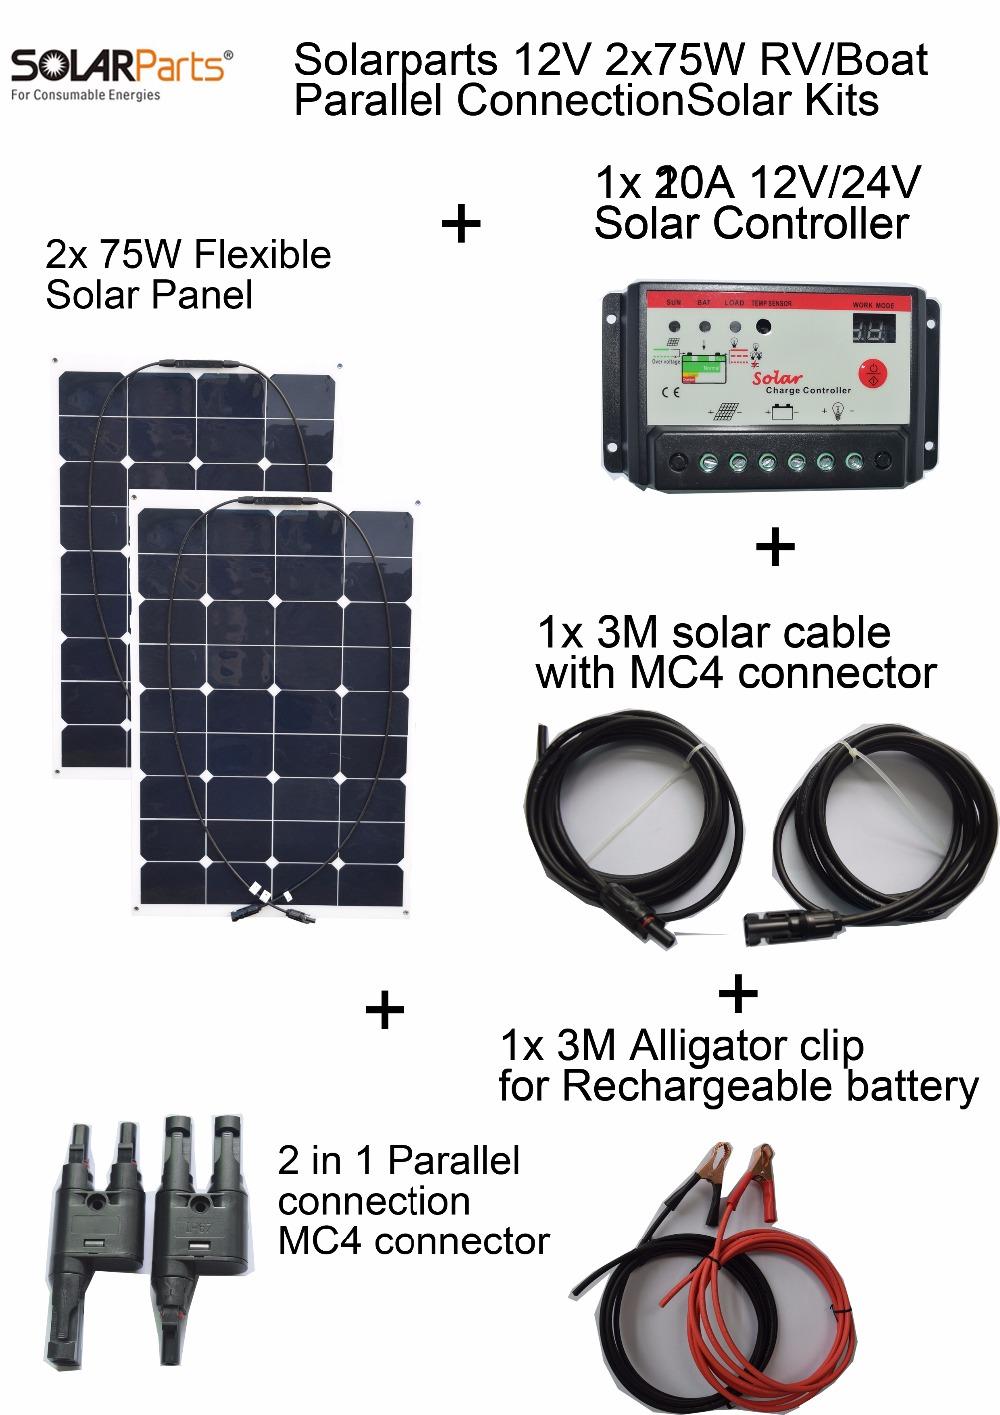 Solarparts 2x75W DIY RV/Boat Kits Solar System 2 x75W flexible solar panel 1x 10A solar controller 1 set 3M MC4 cable 1 set clip(China (Mainland))